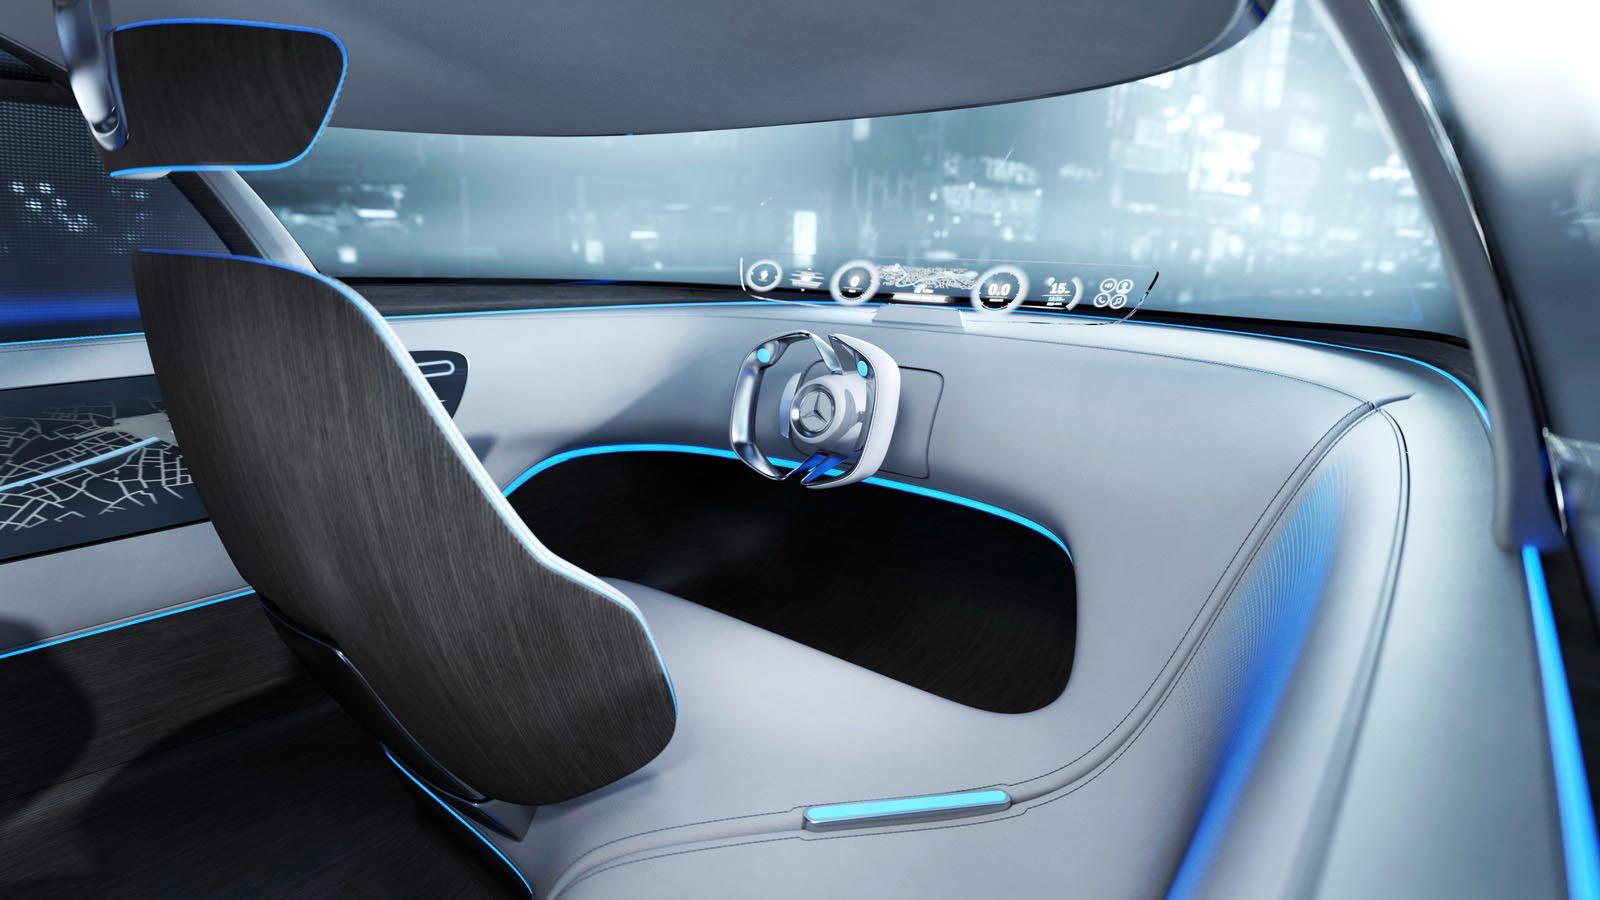 Photo of Τι γίνεται με τα πλήρως αυτόνομα αυτοκίνητα;